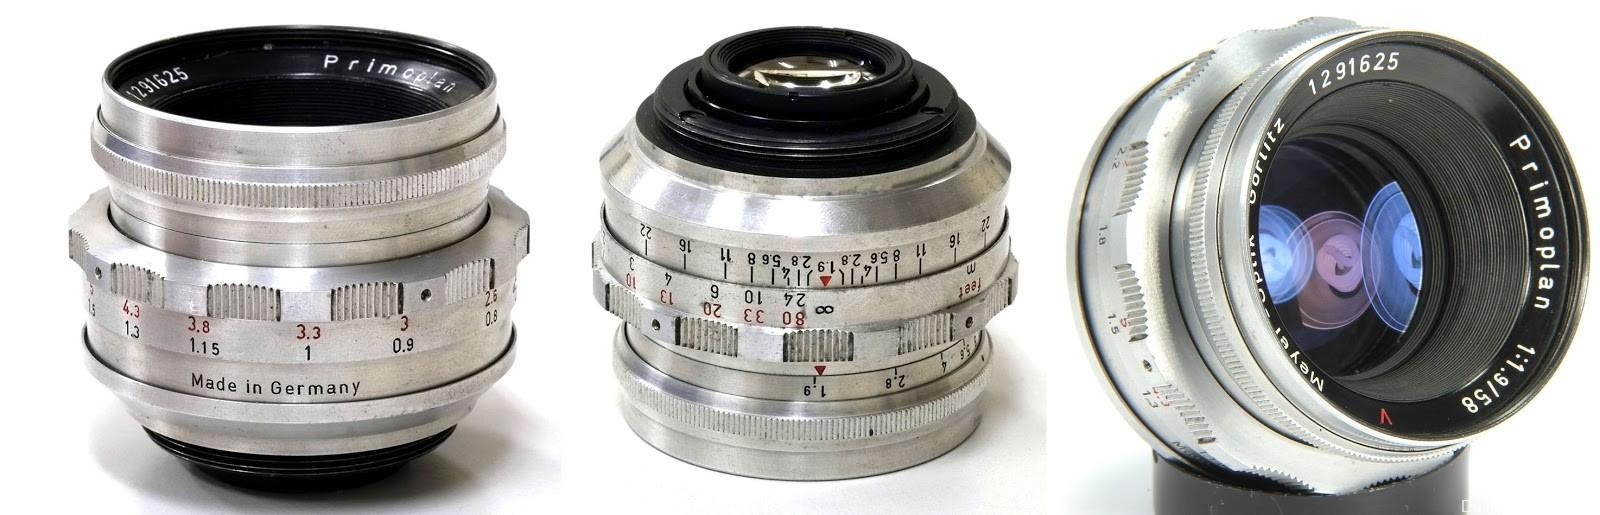 梅耶Meyer-Optik Gorlitz Primoplan 58mm F1.9(M42)镜头测试及样片